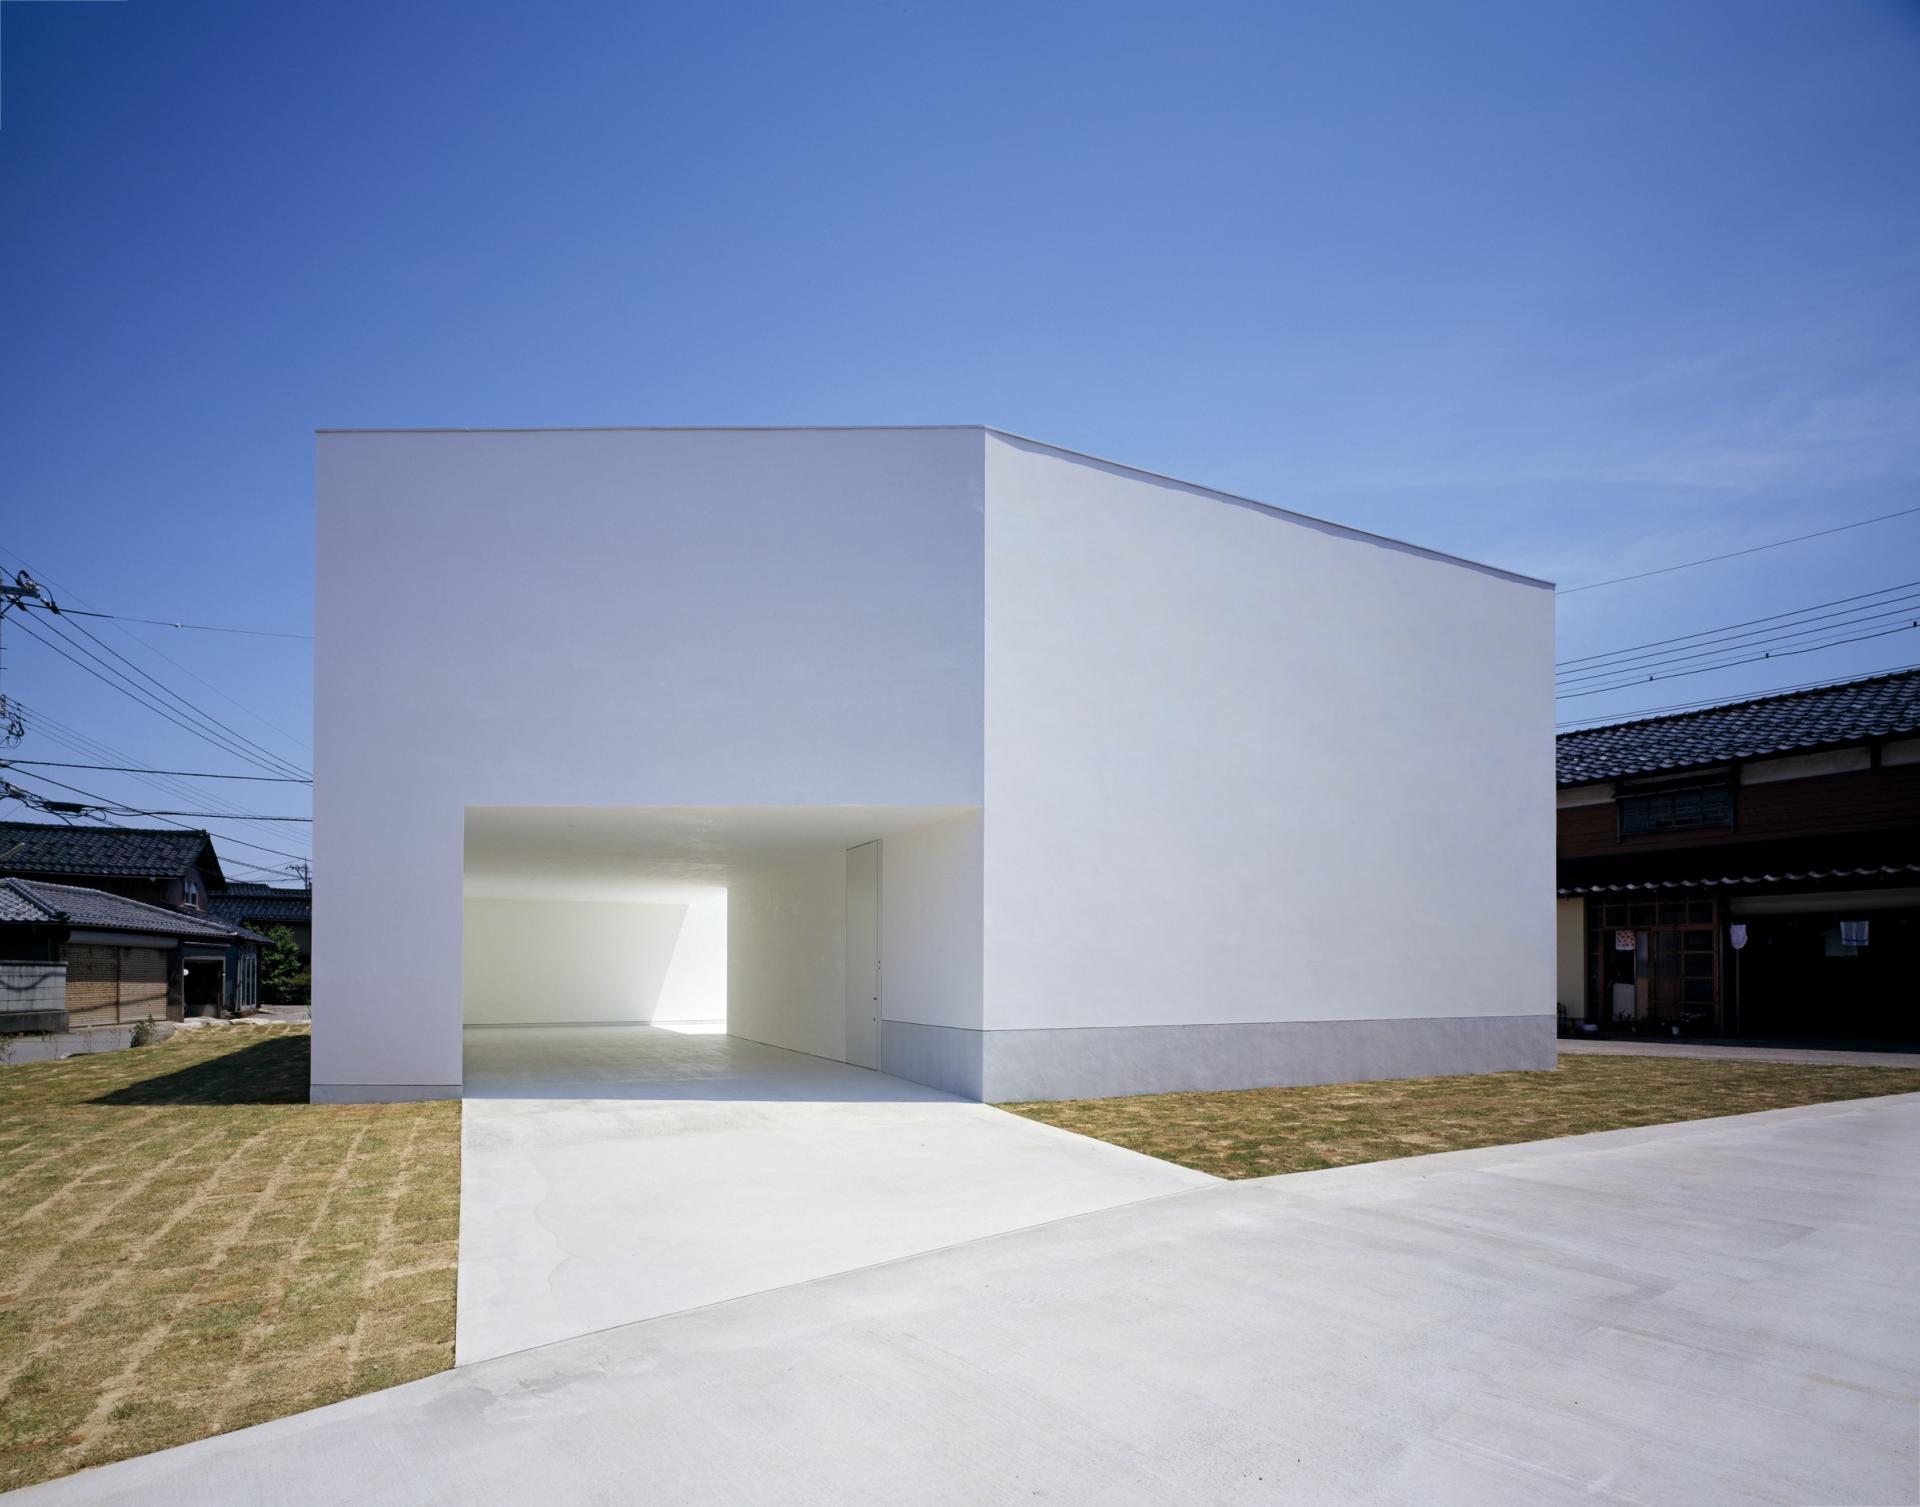 White cave house by takuro yamamoto architects for Arquitectura minimalista casas